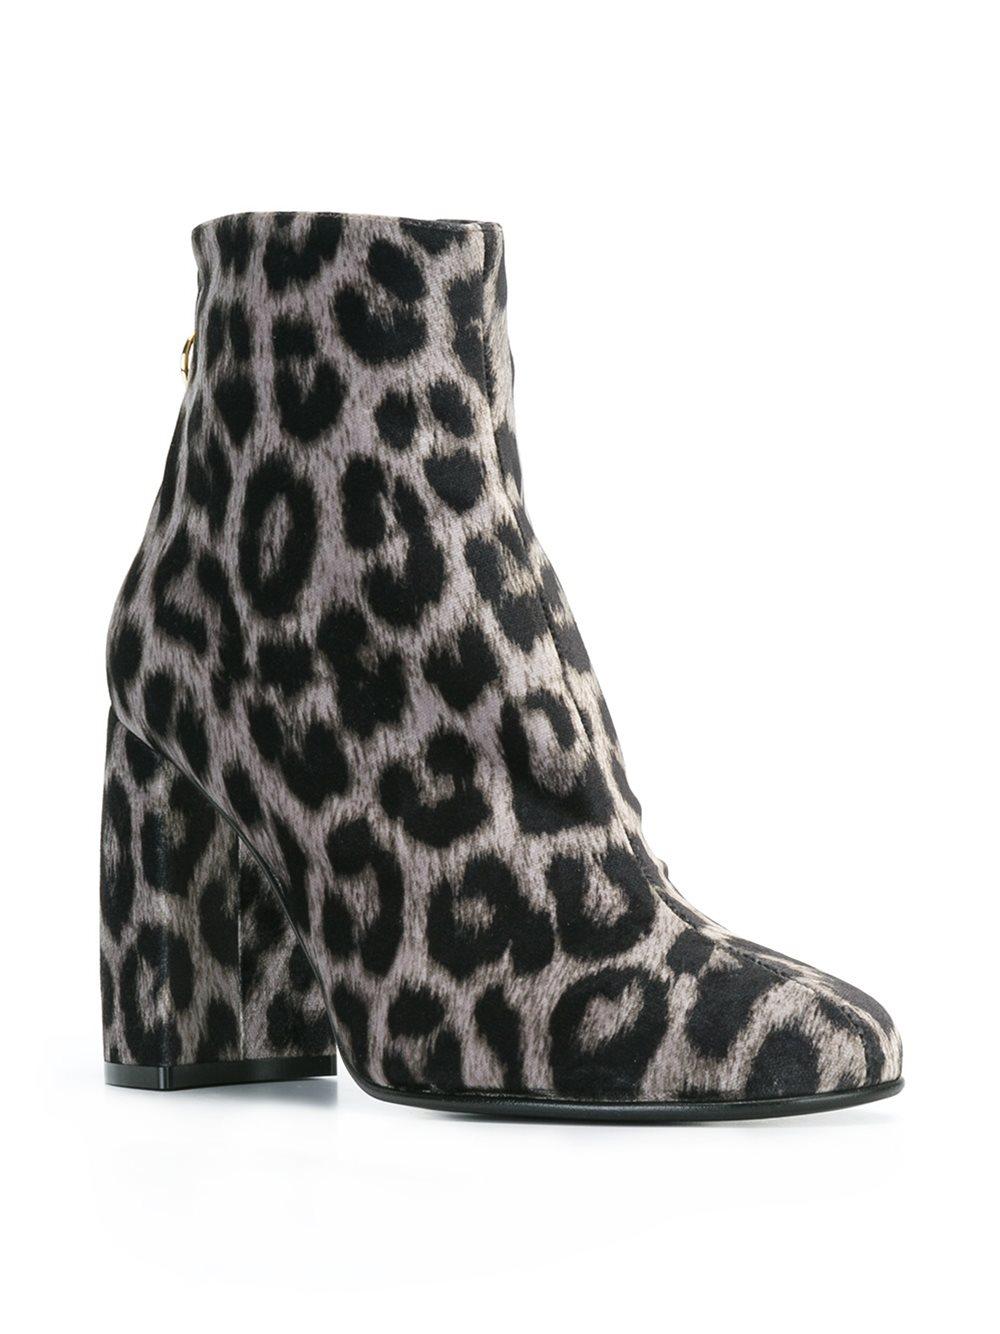 Stella McCartney Cotton Leopard Print Ankle Boots in Grey (Grey)